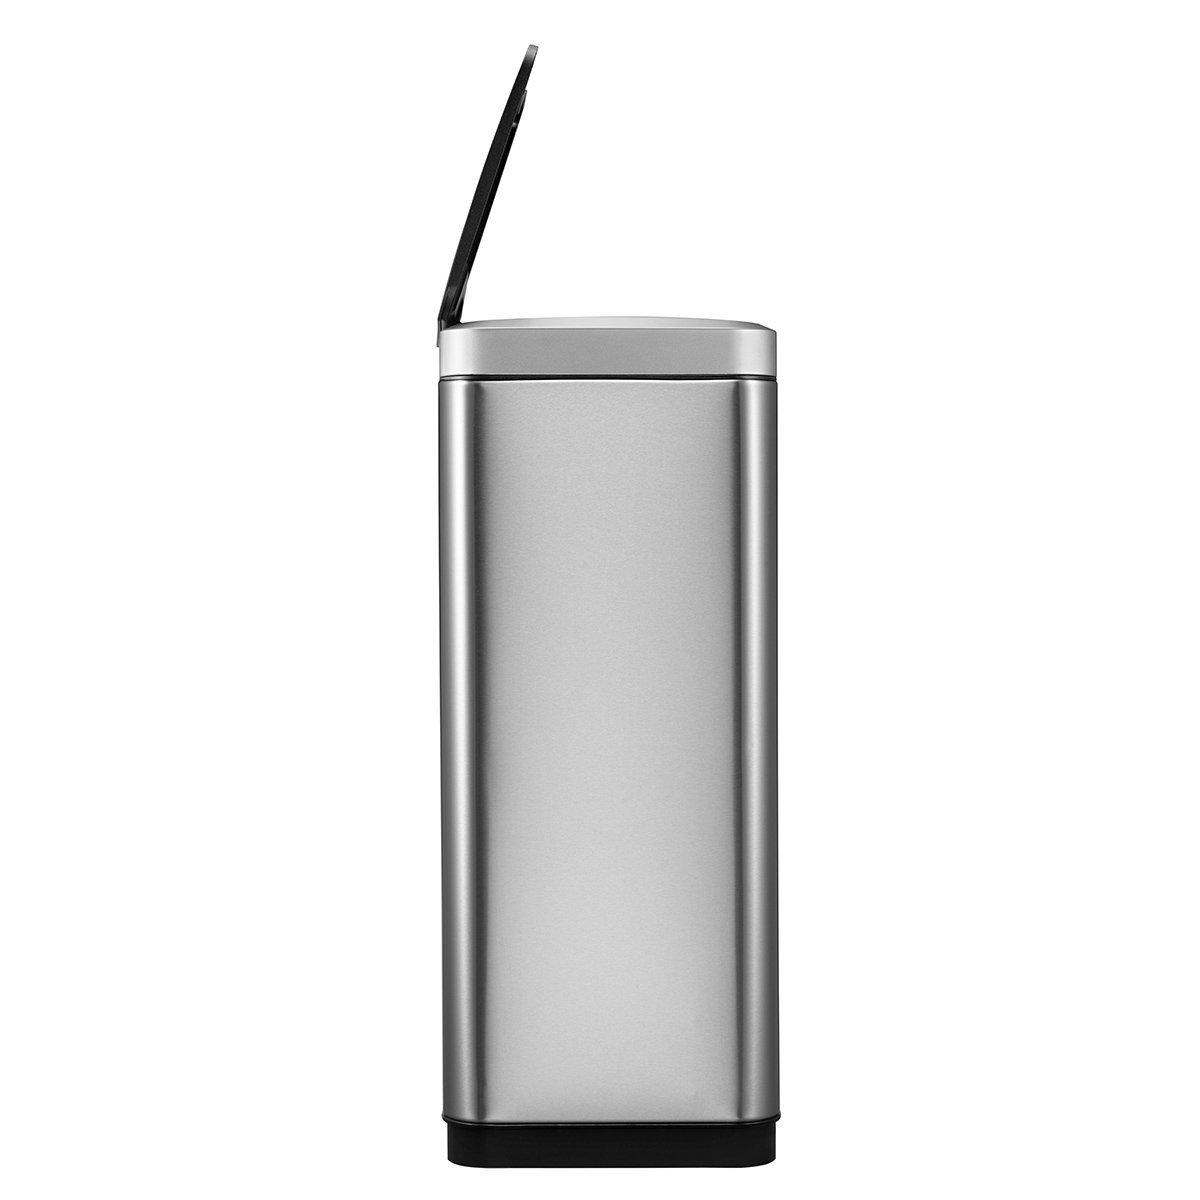 Amazon.com: EKO Mirage 50 Liter / 13.2 Gallon Rectangular Motion Sensor Trash Can, Stainless Steel: Home & Kitchen